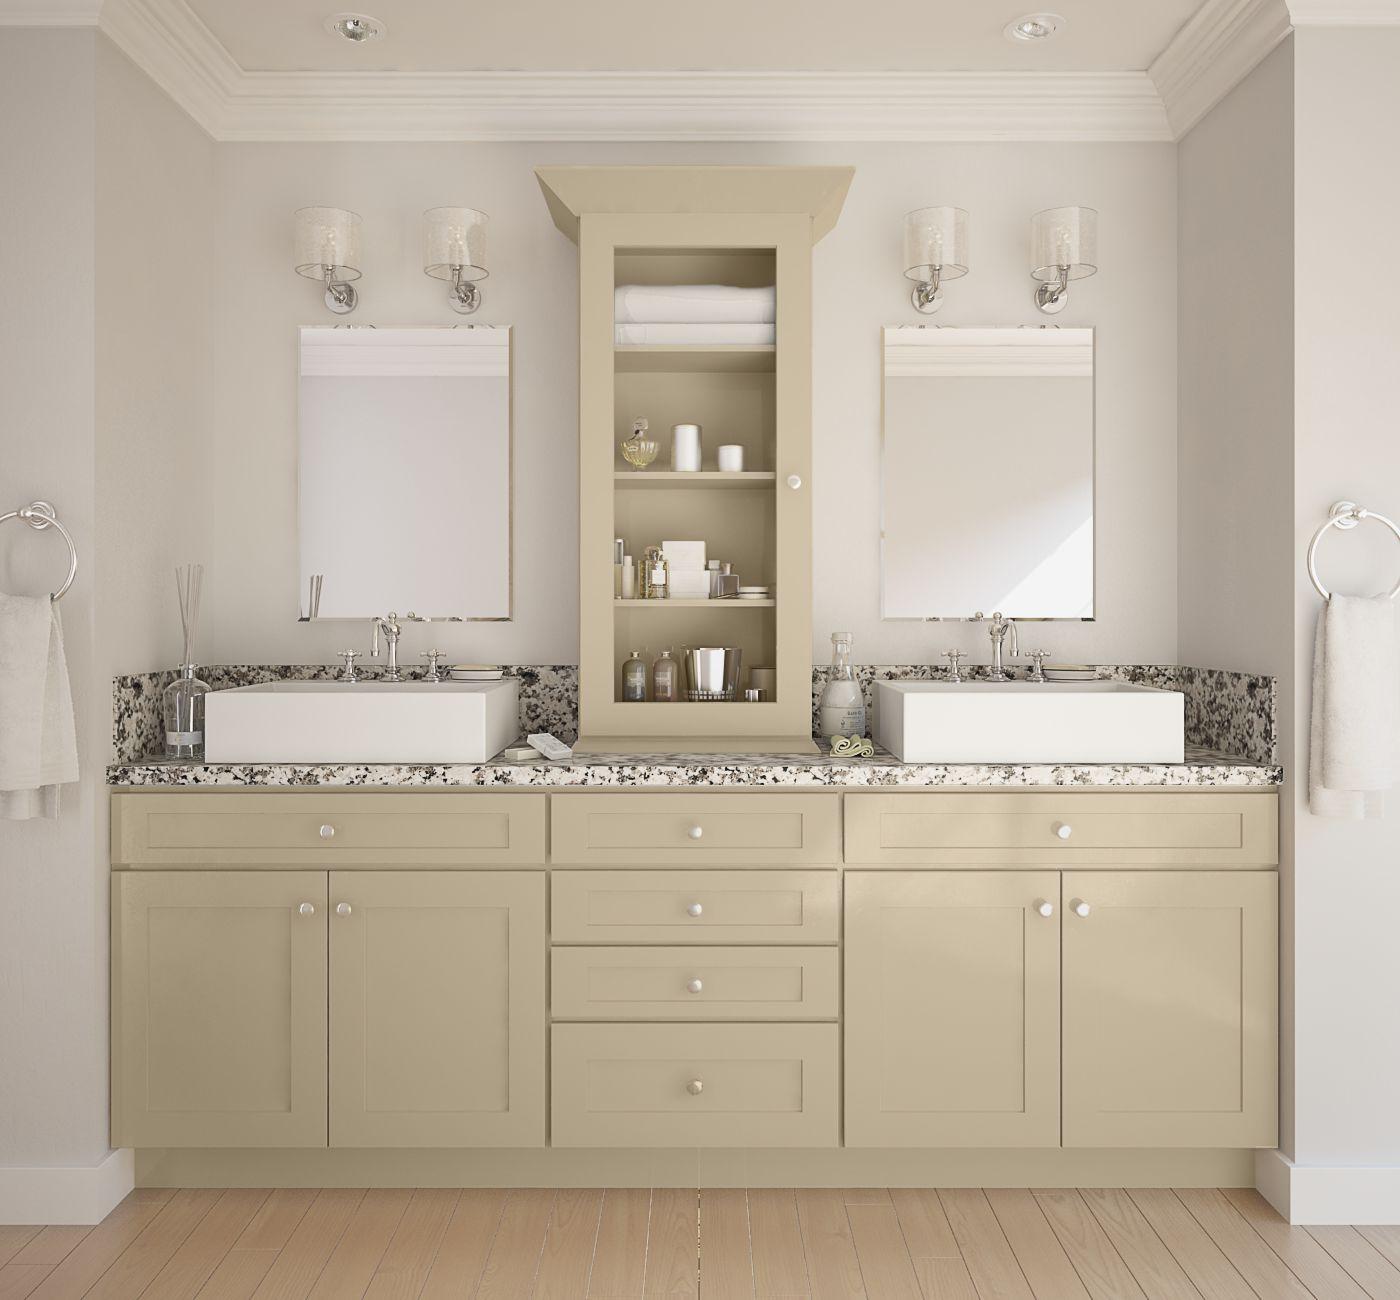 Semi Custom Bathroom Vanity: Society Shaker Khaki (Semi-Custom)